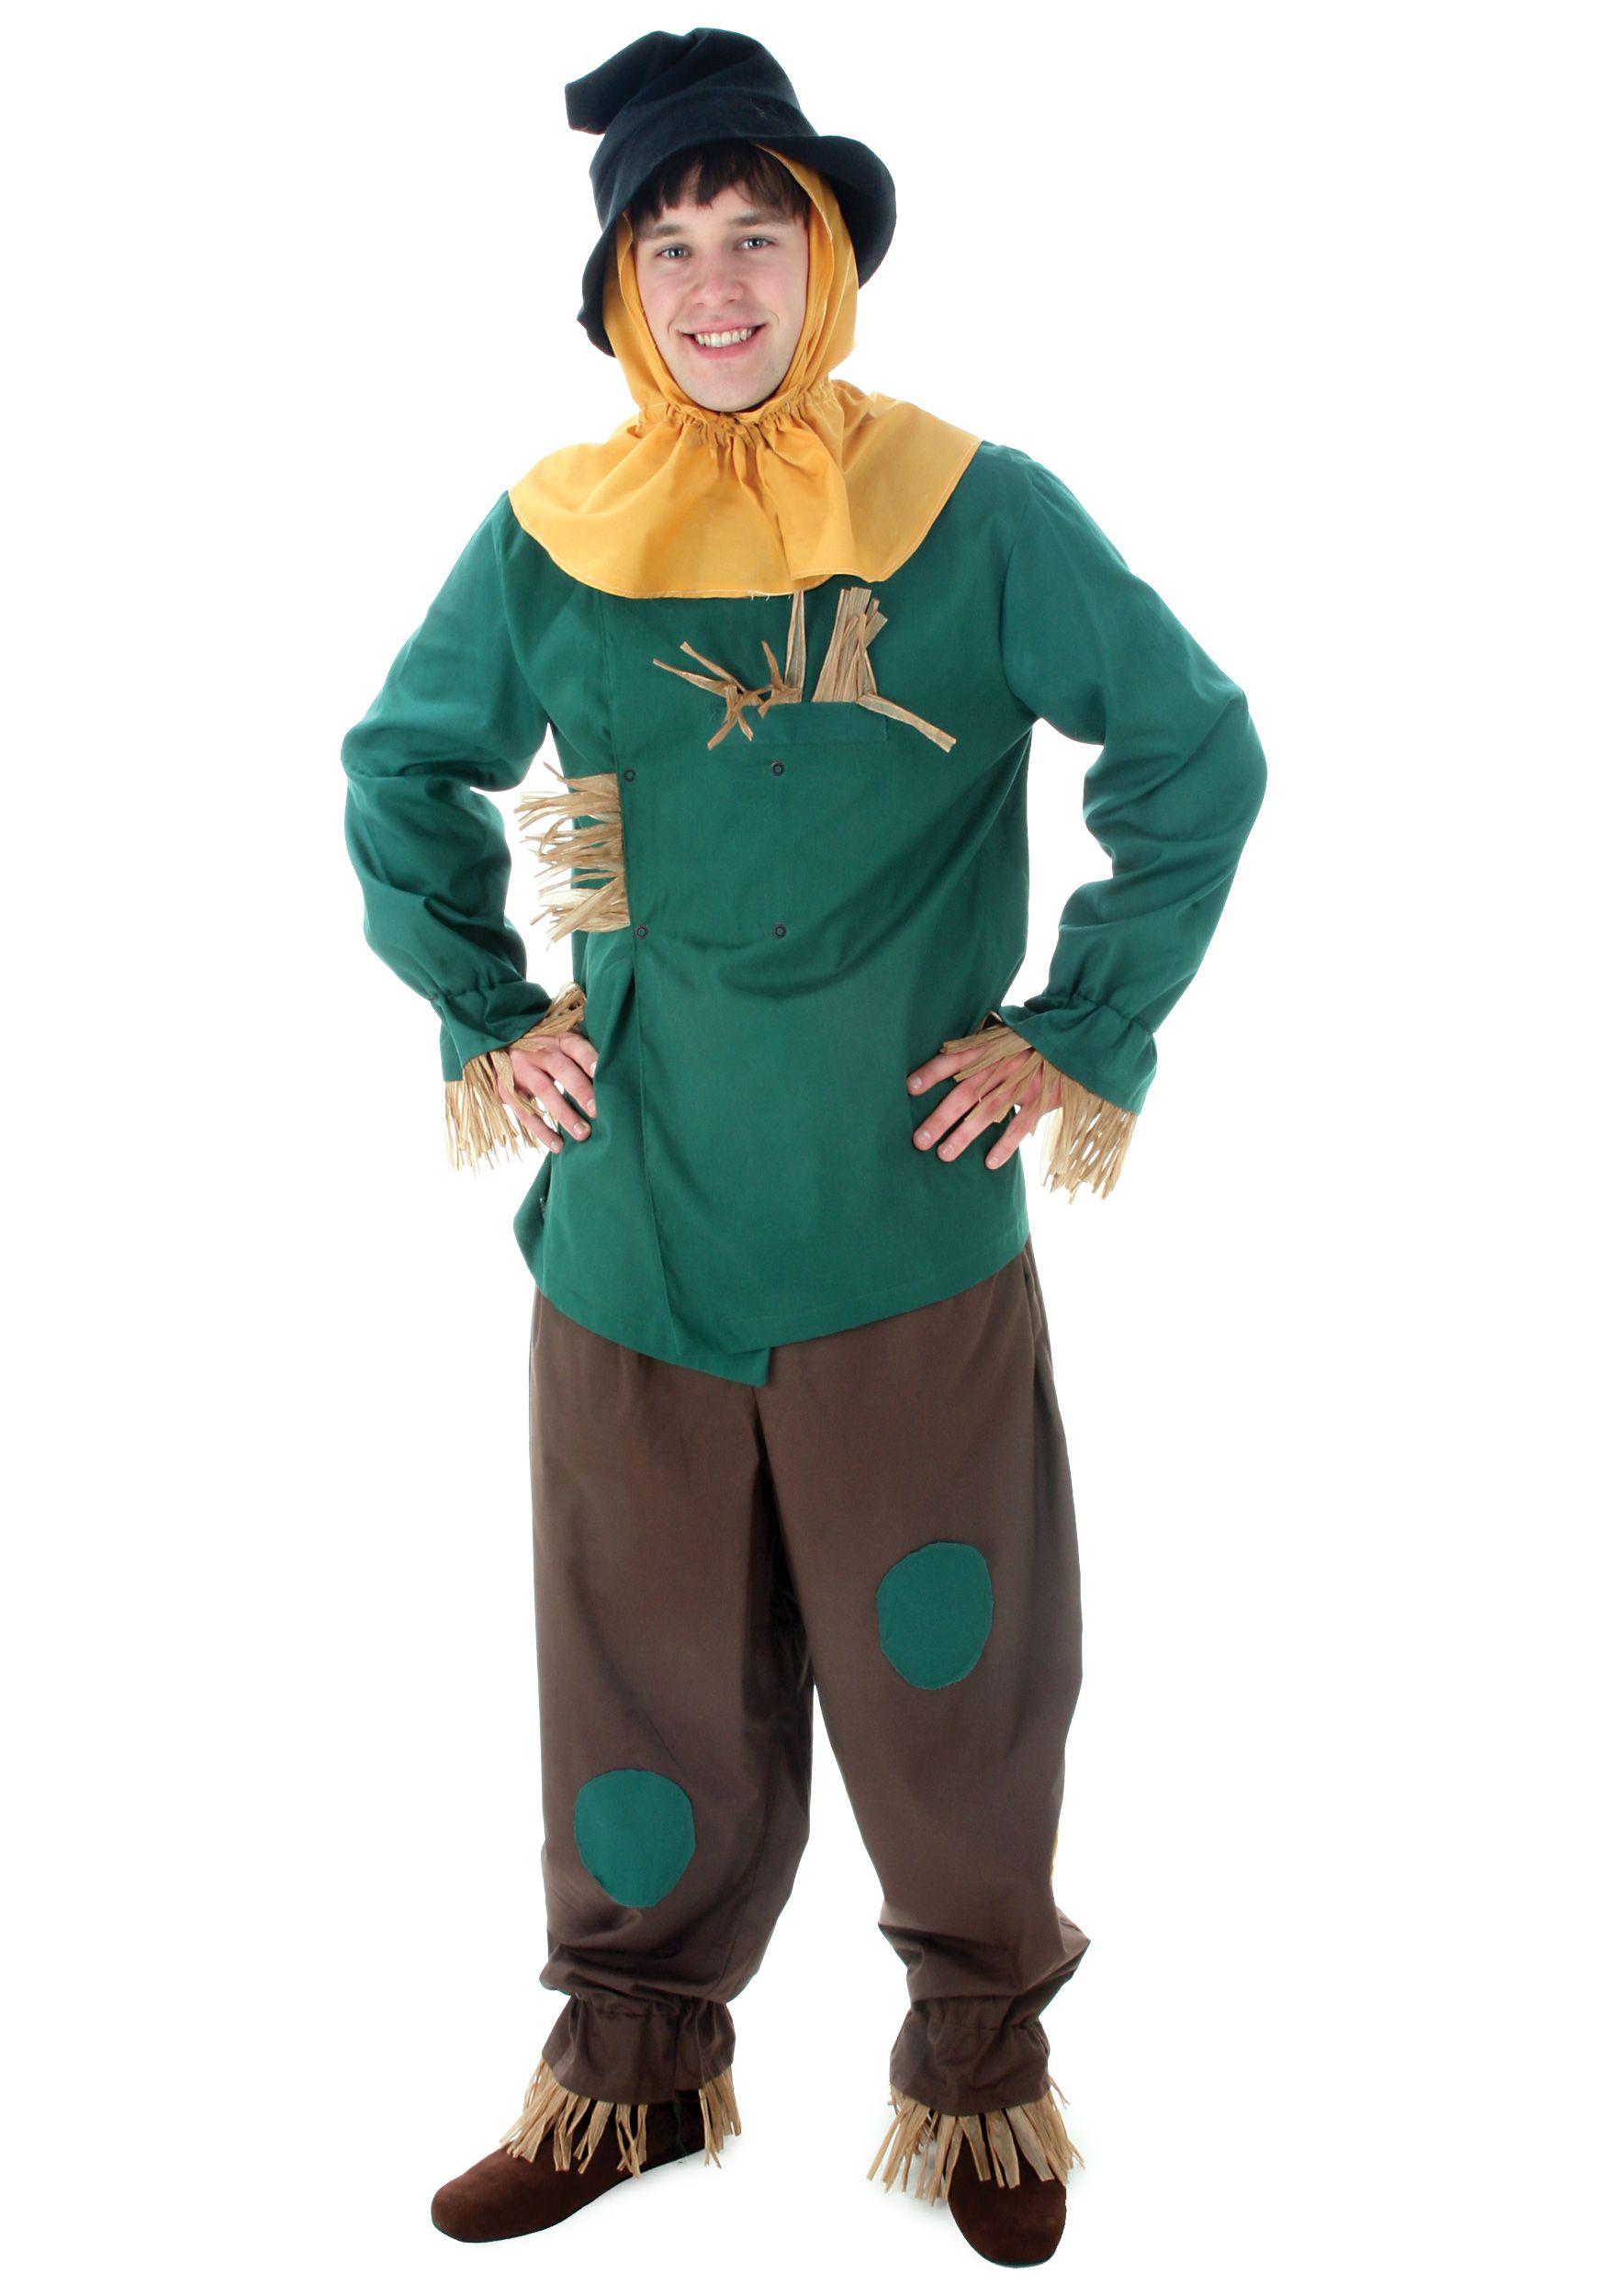 b84739bff2f Male Scarecrow Costume - Jeff | Fall/Halloween | Scarecrow costume ...